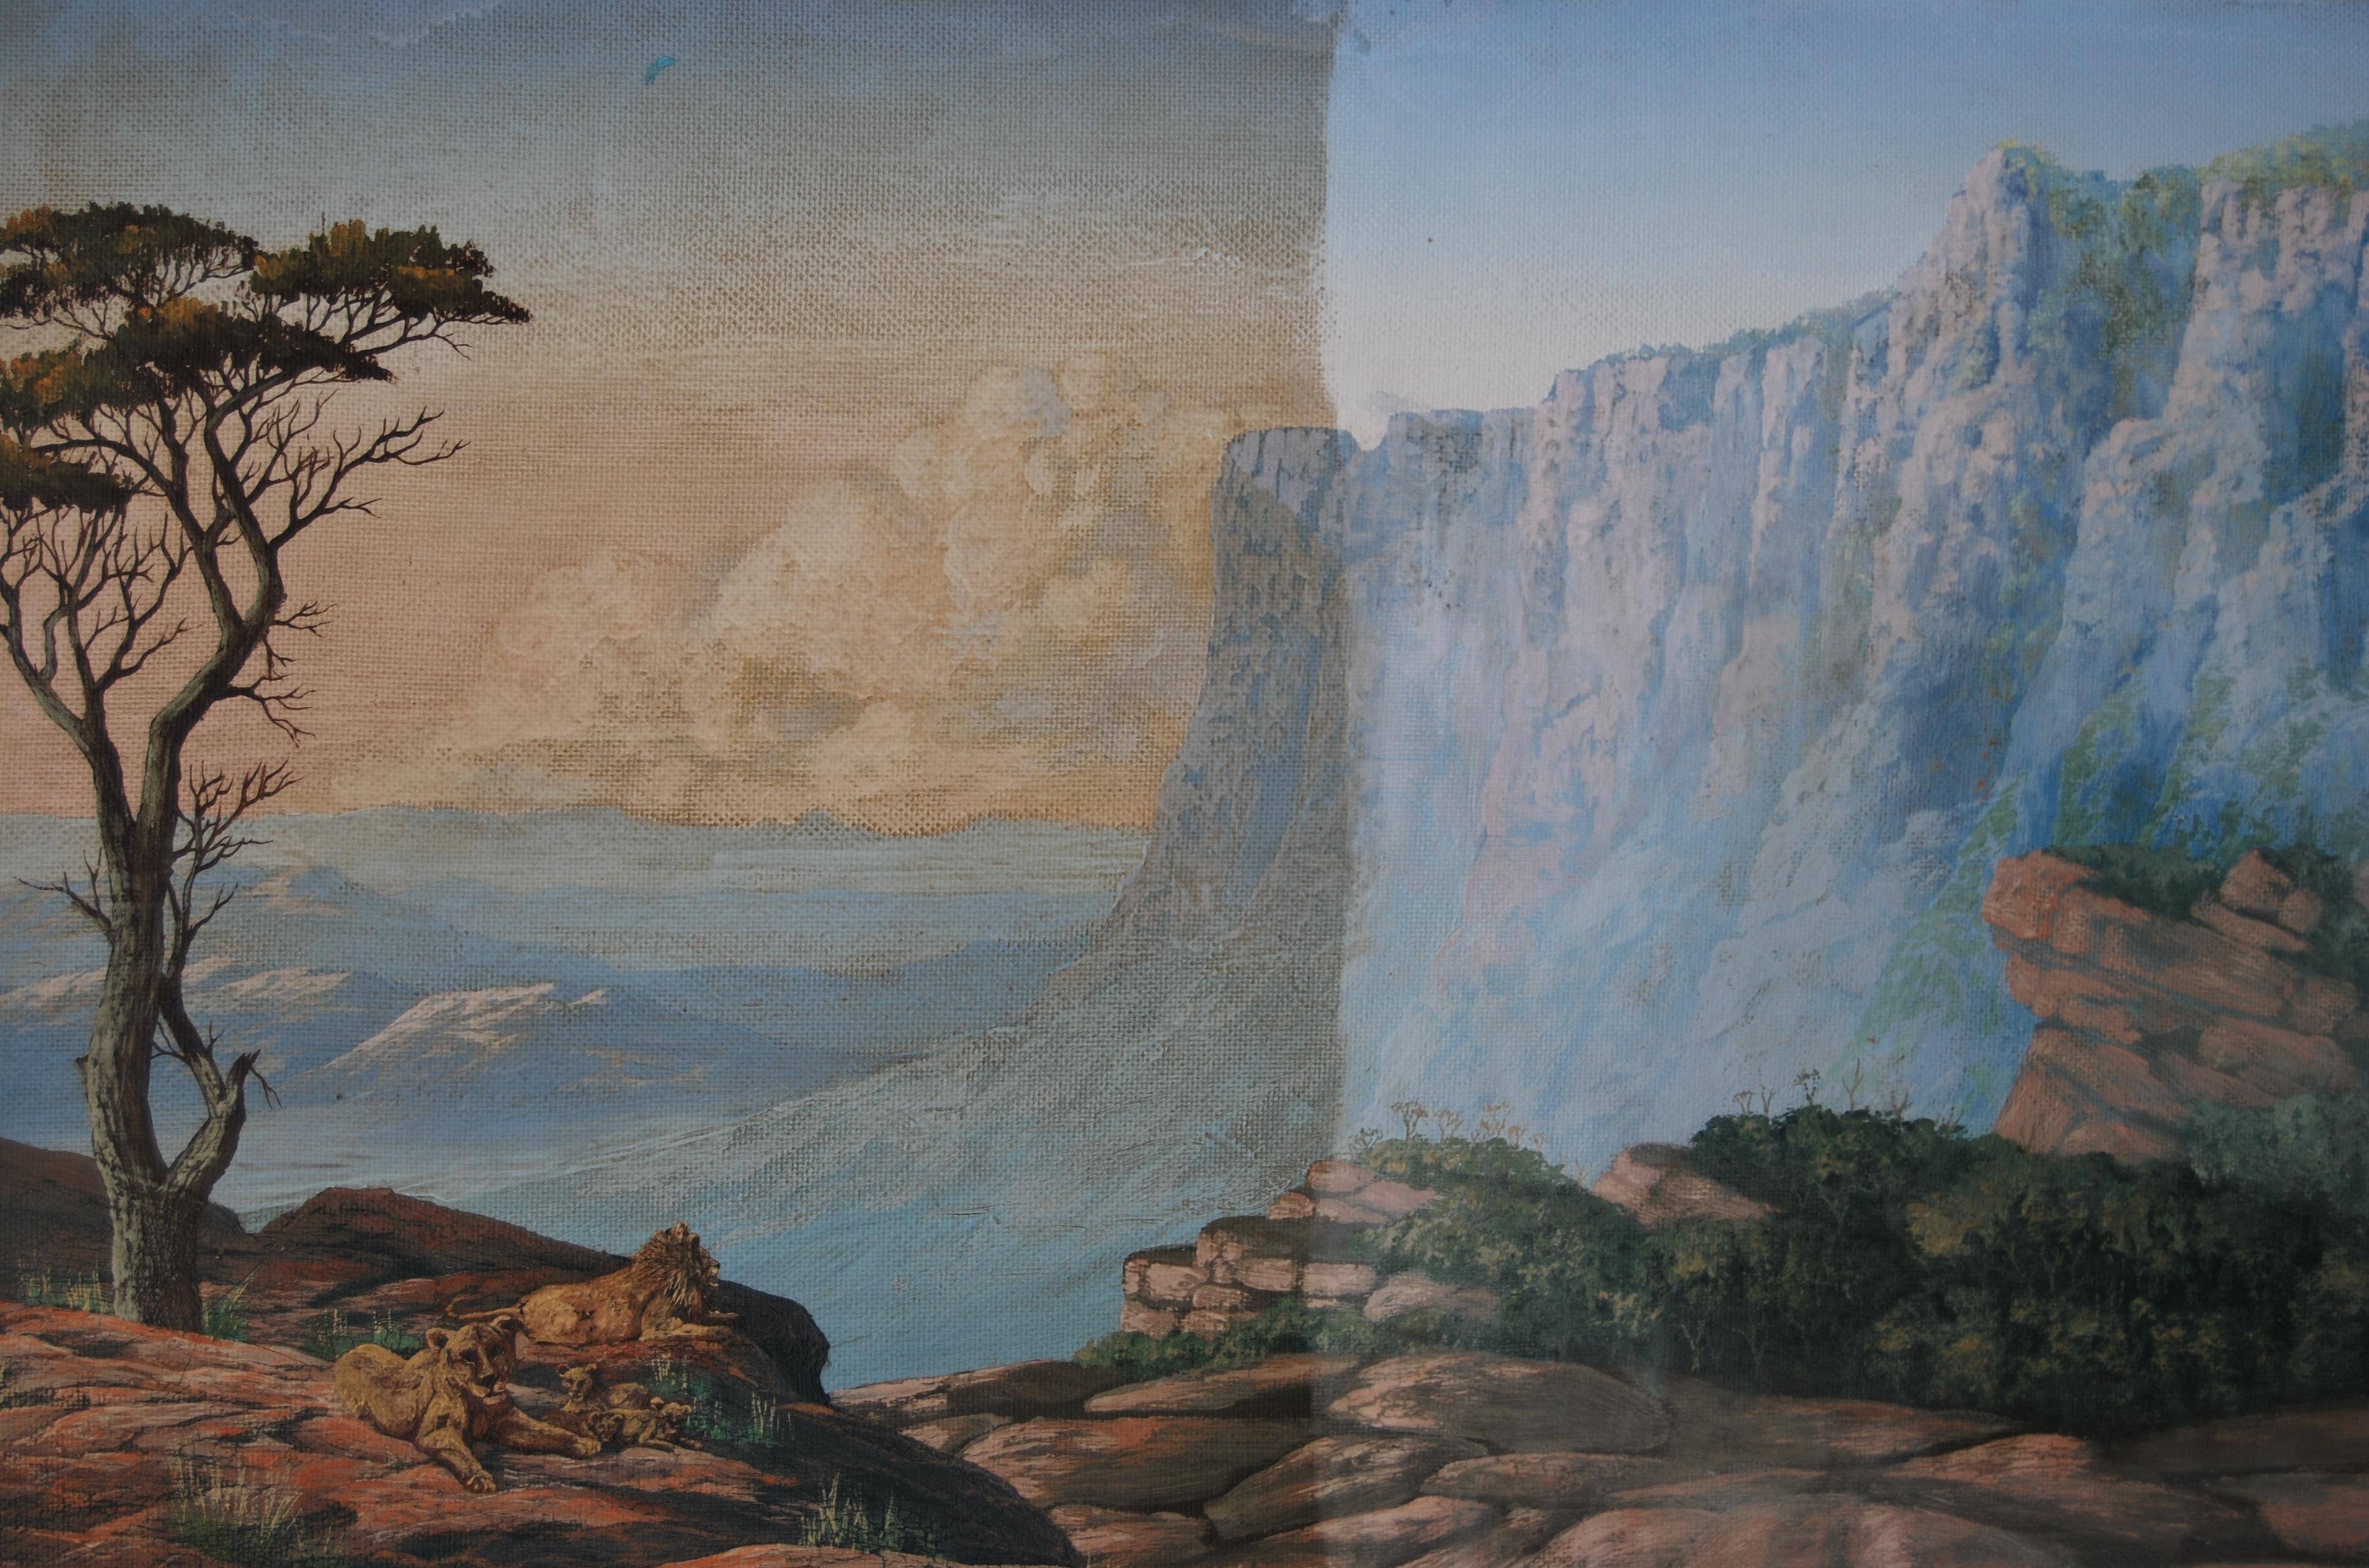 Lion Pride Landscape, Oil on board